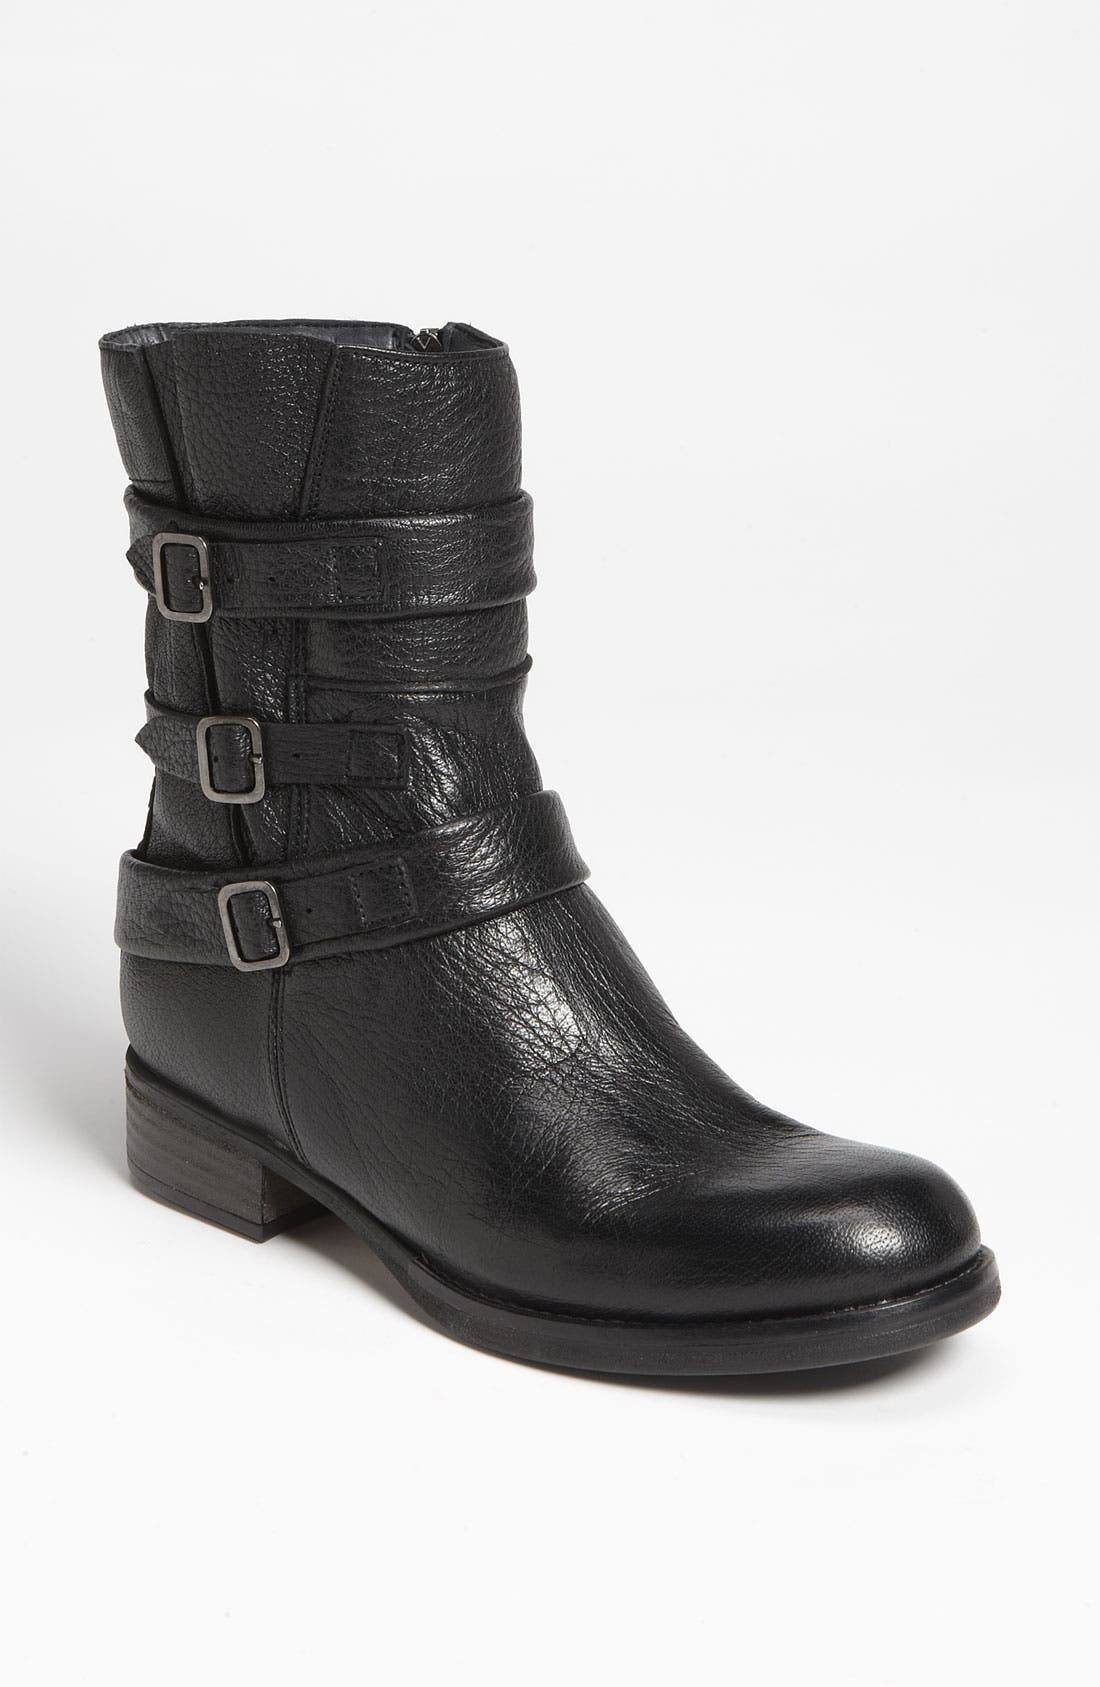 Alternate Image 1 Selected - Alberto Fermani Ankle Strap Short Boot